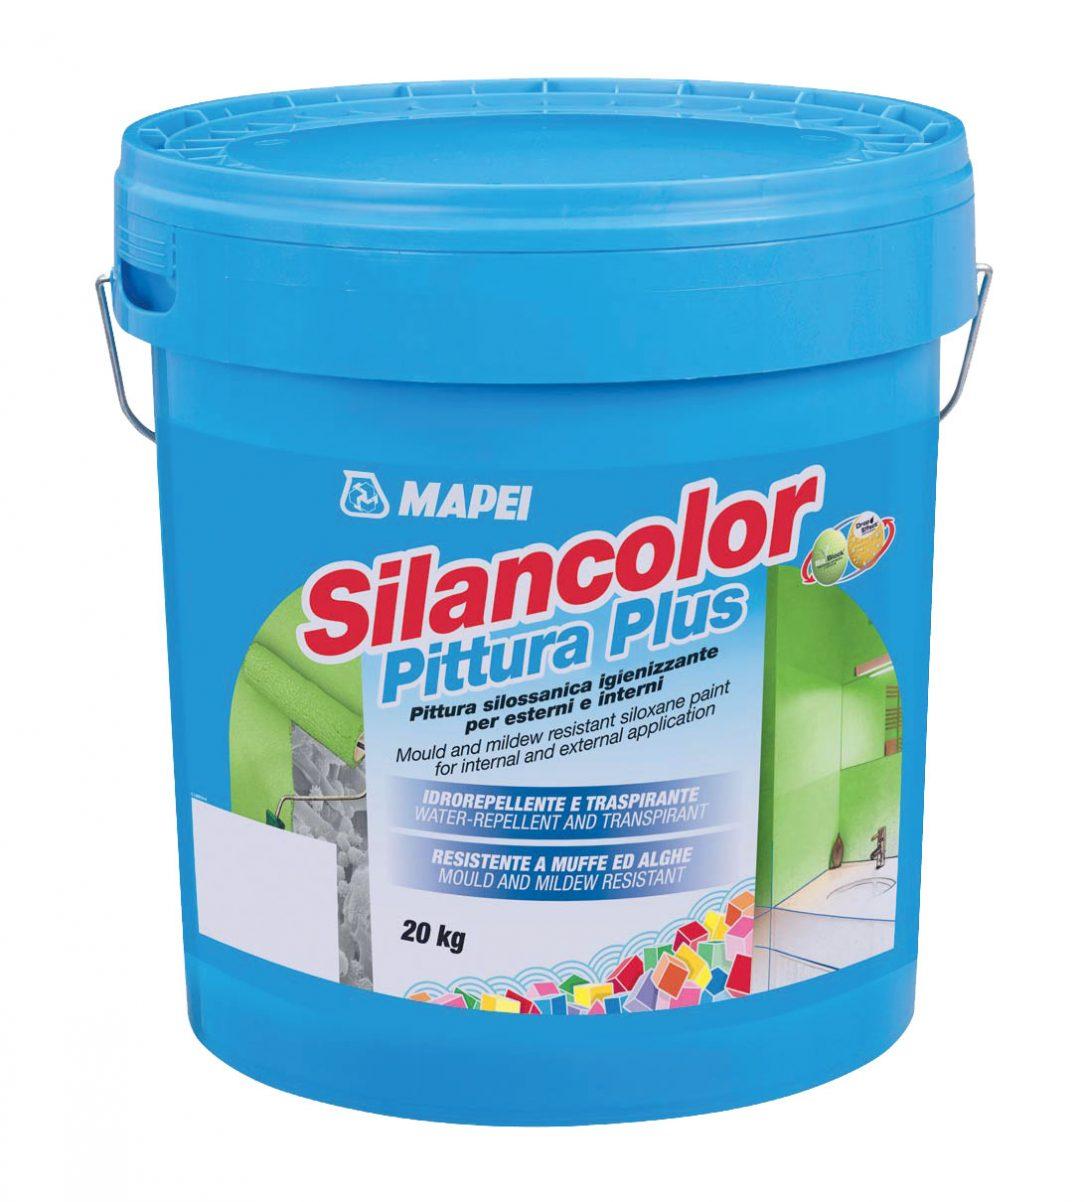 Silancolor Pittura Plus